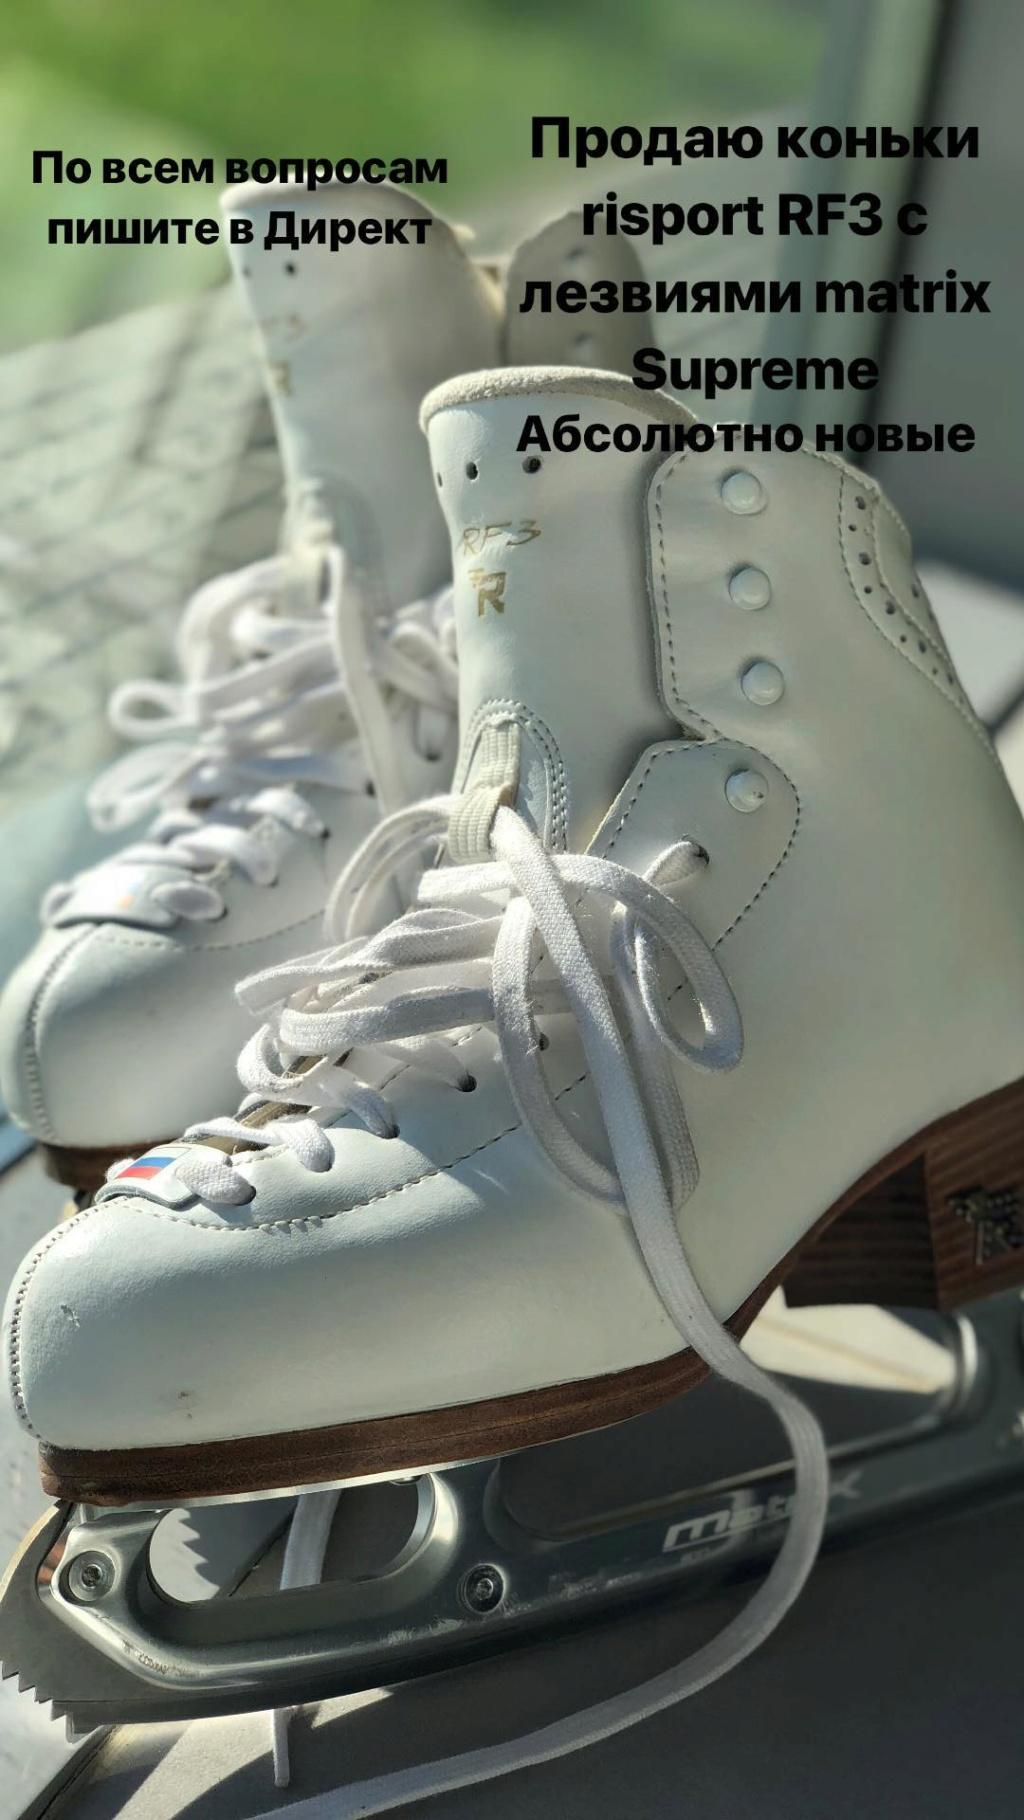 Александра Бойкова-Дмитрий Козловский - Страница 11 15314110